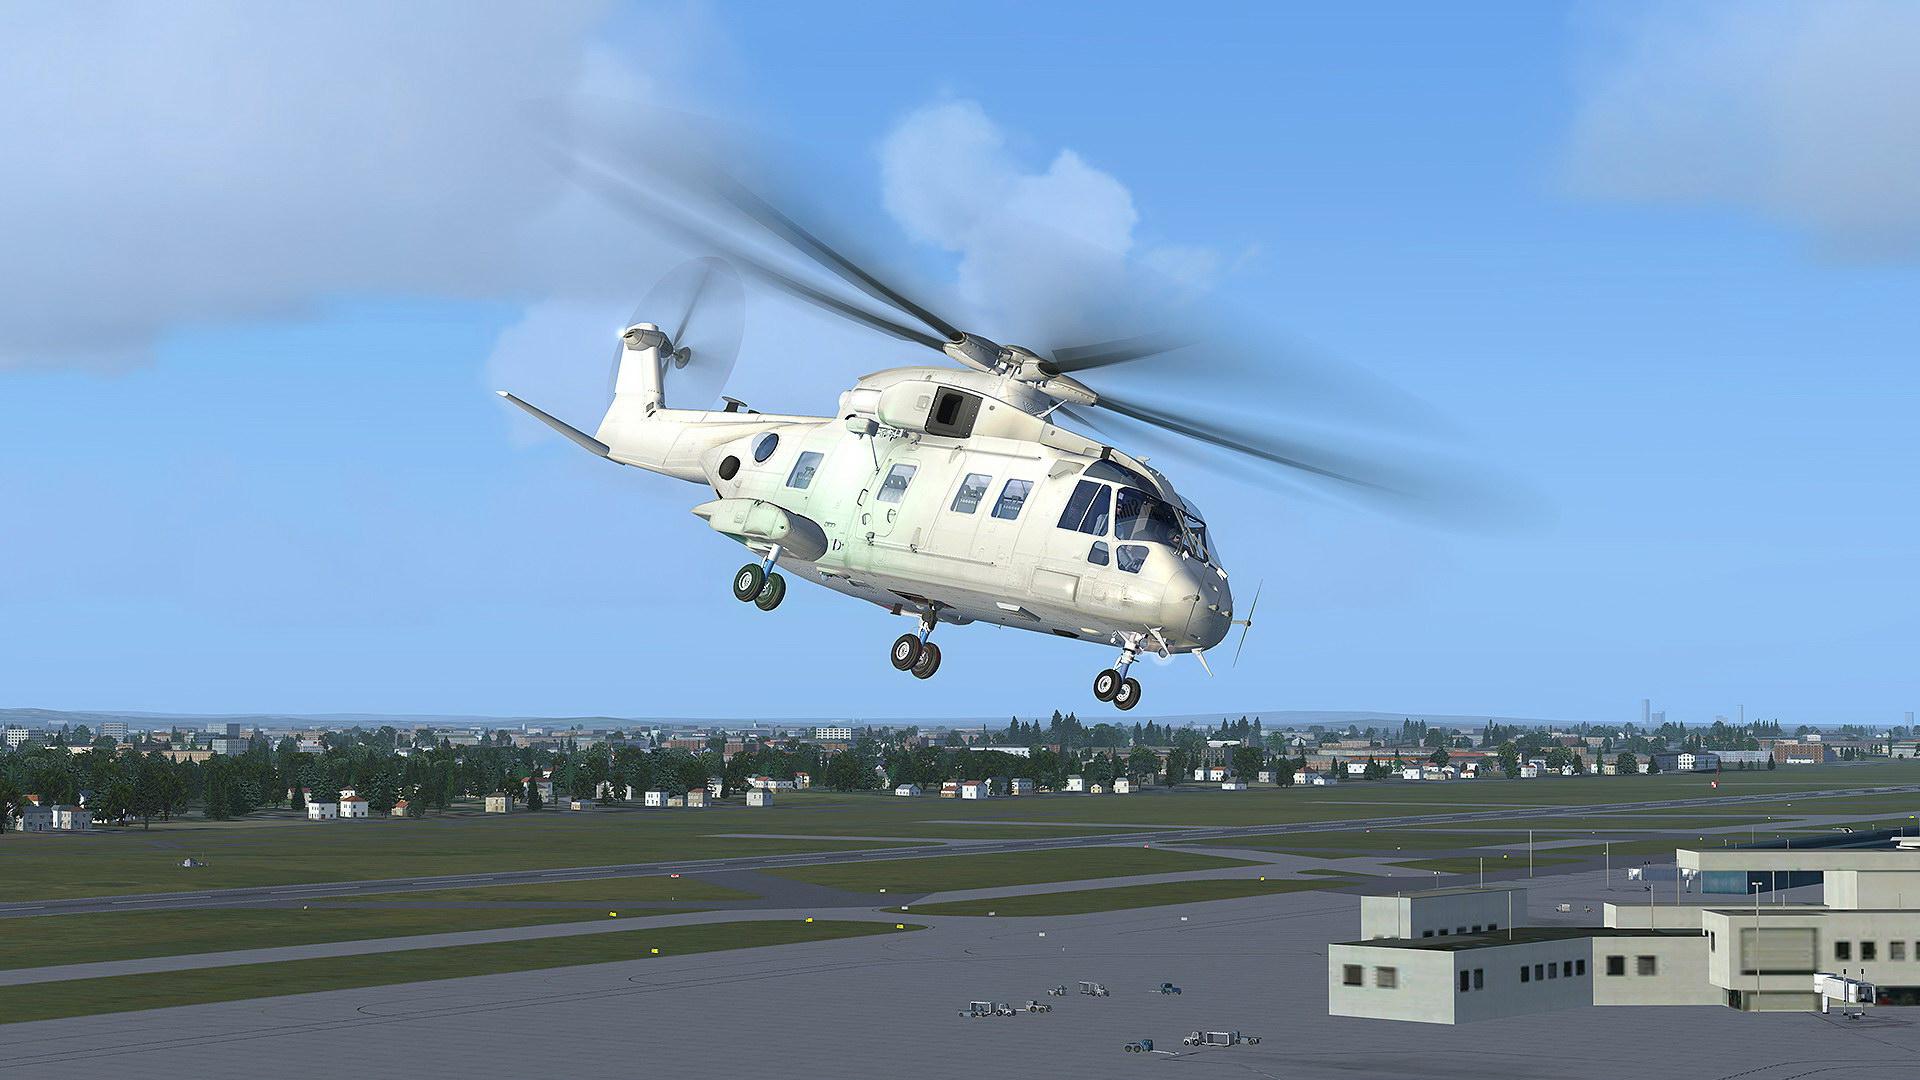 Combat flight simulator games 2015 (high graphics)